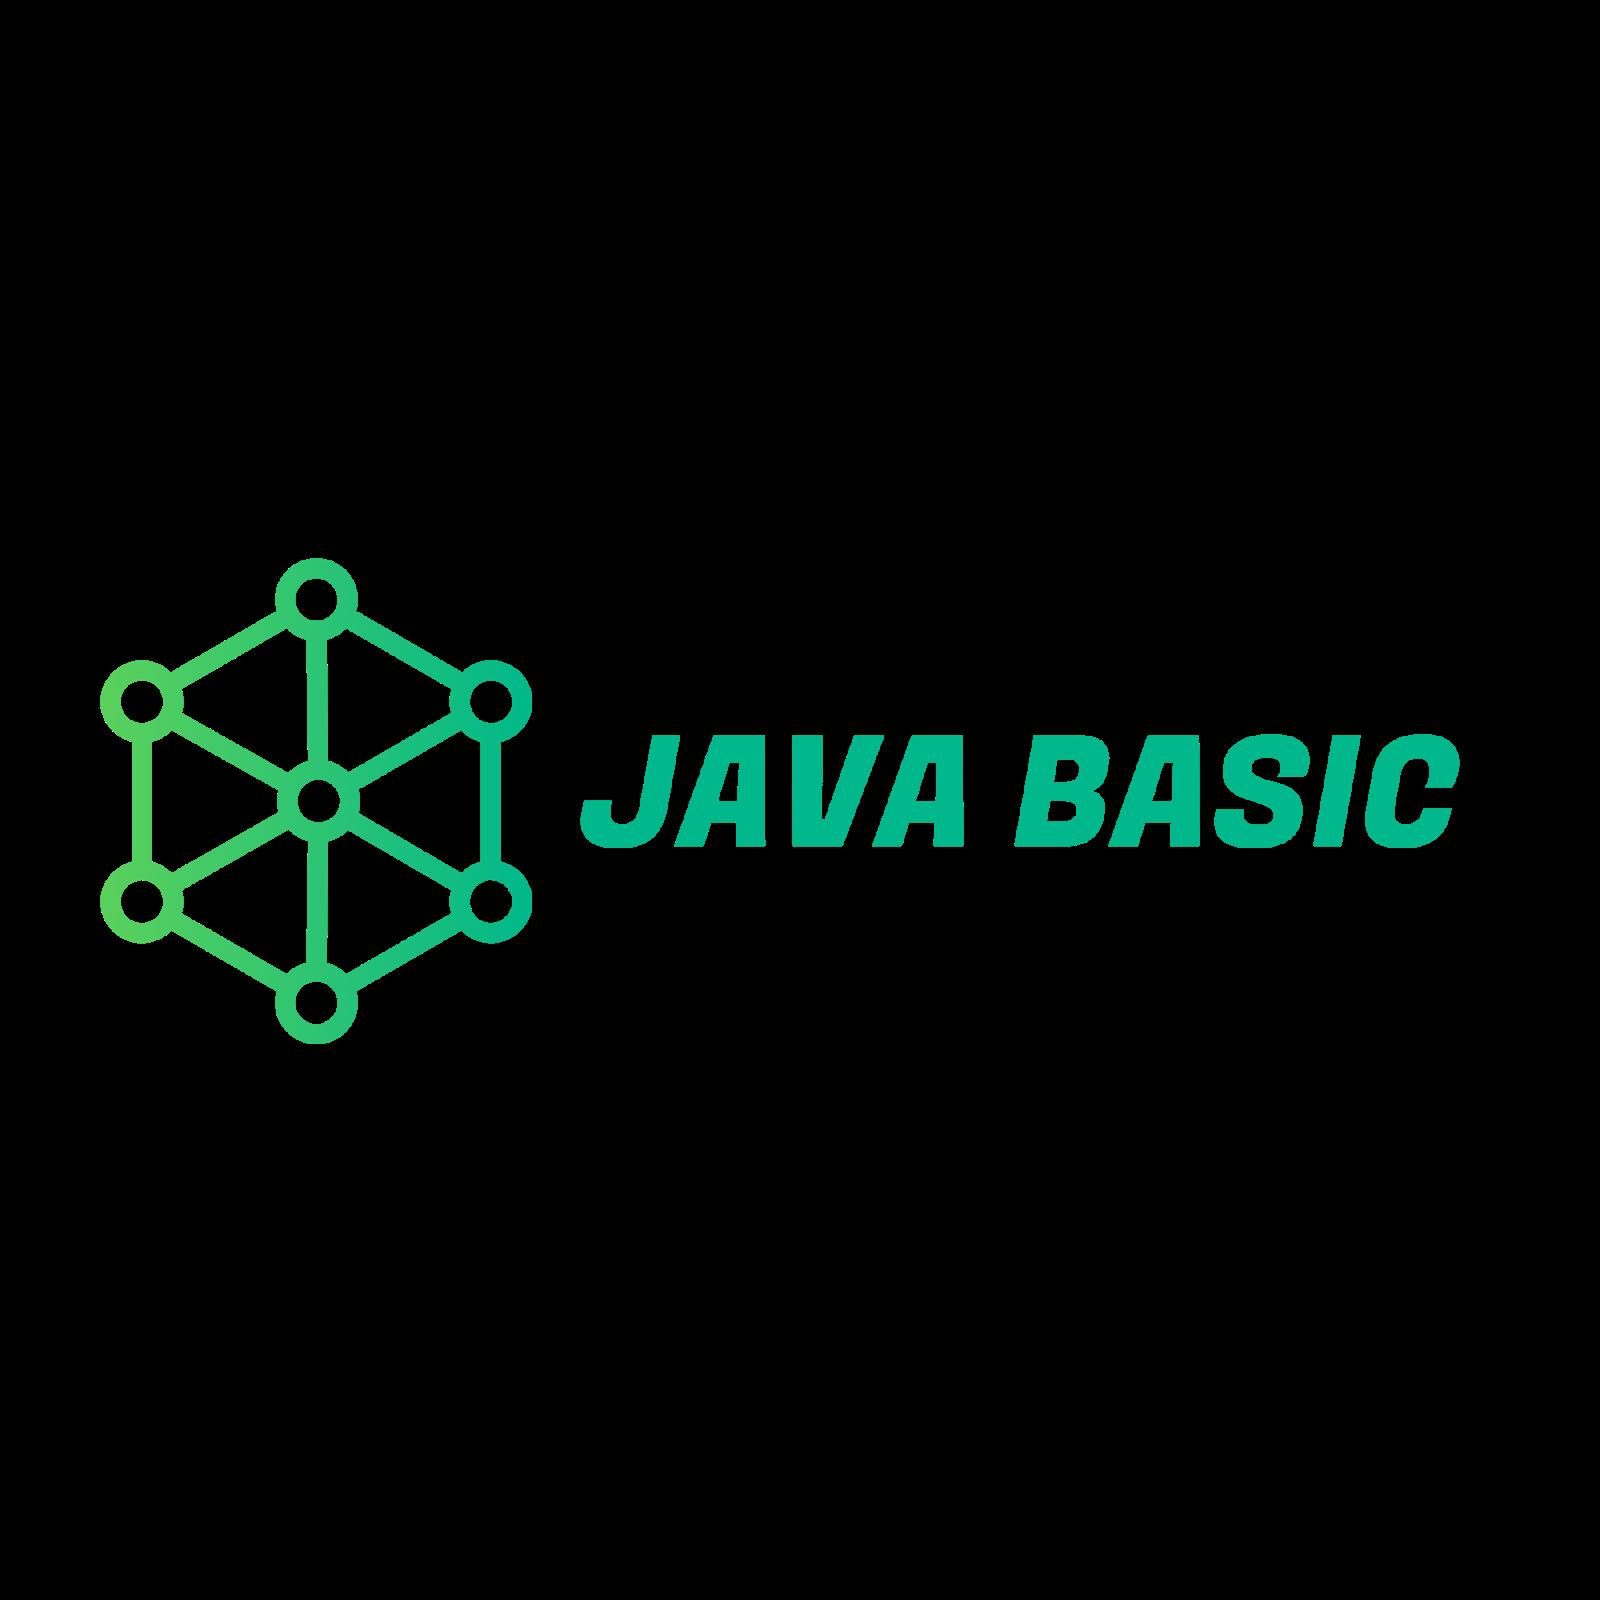 Java Standard Edition (J2SE